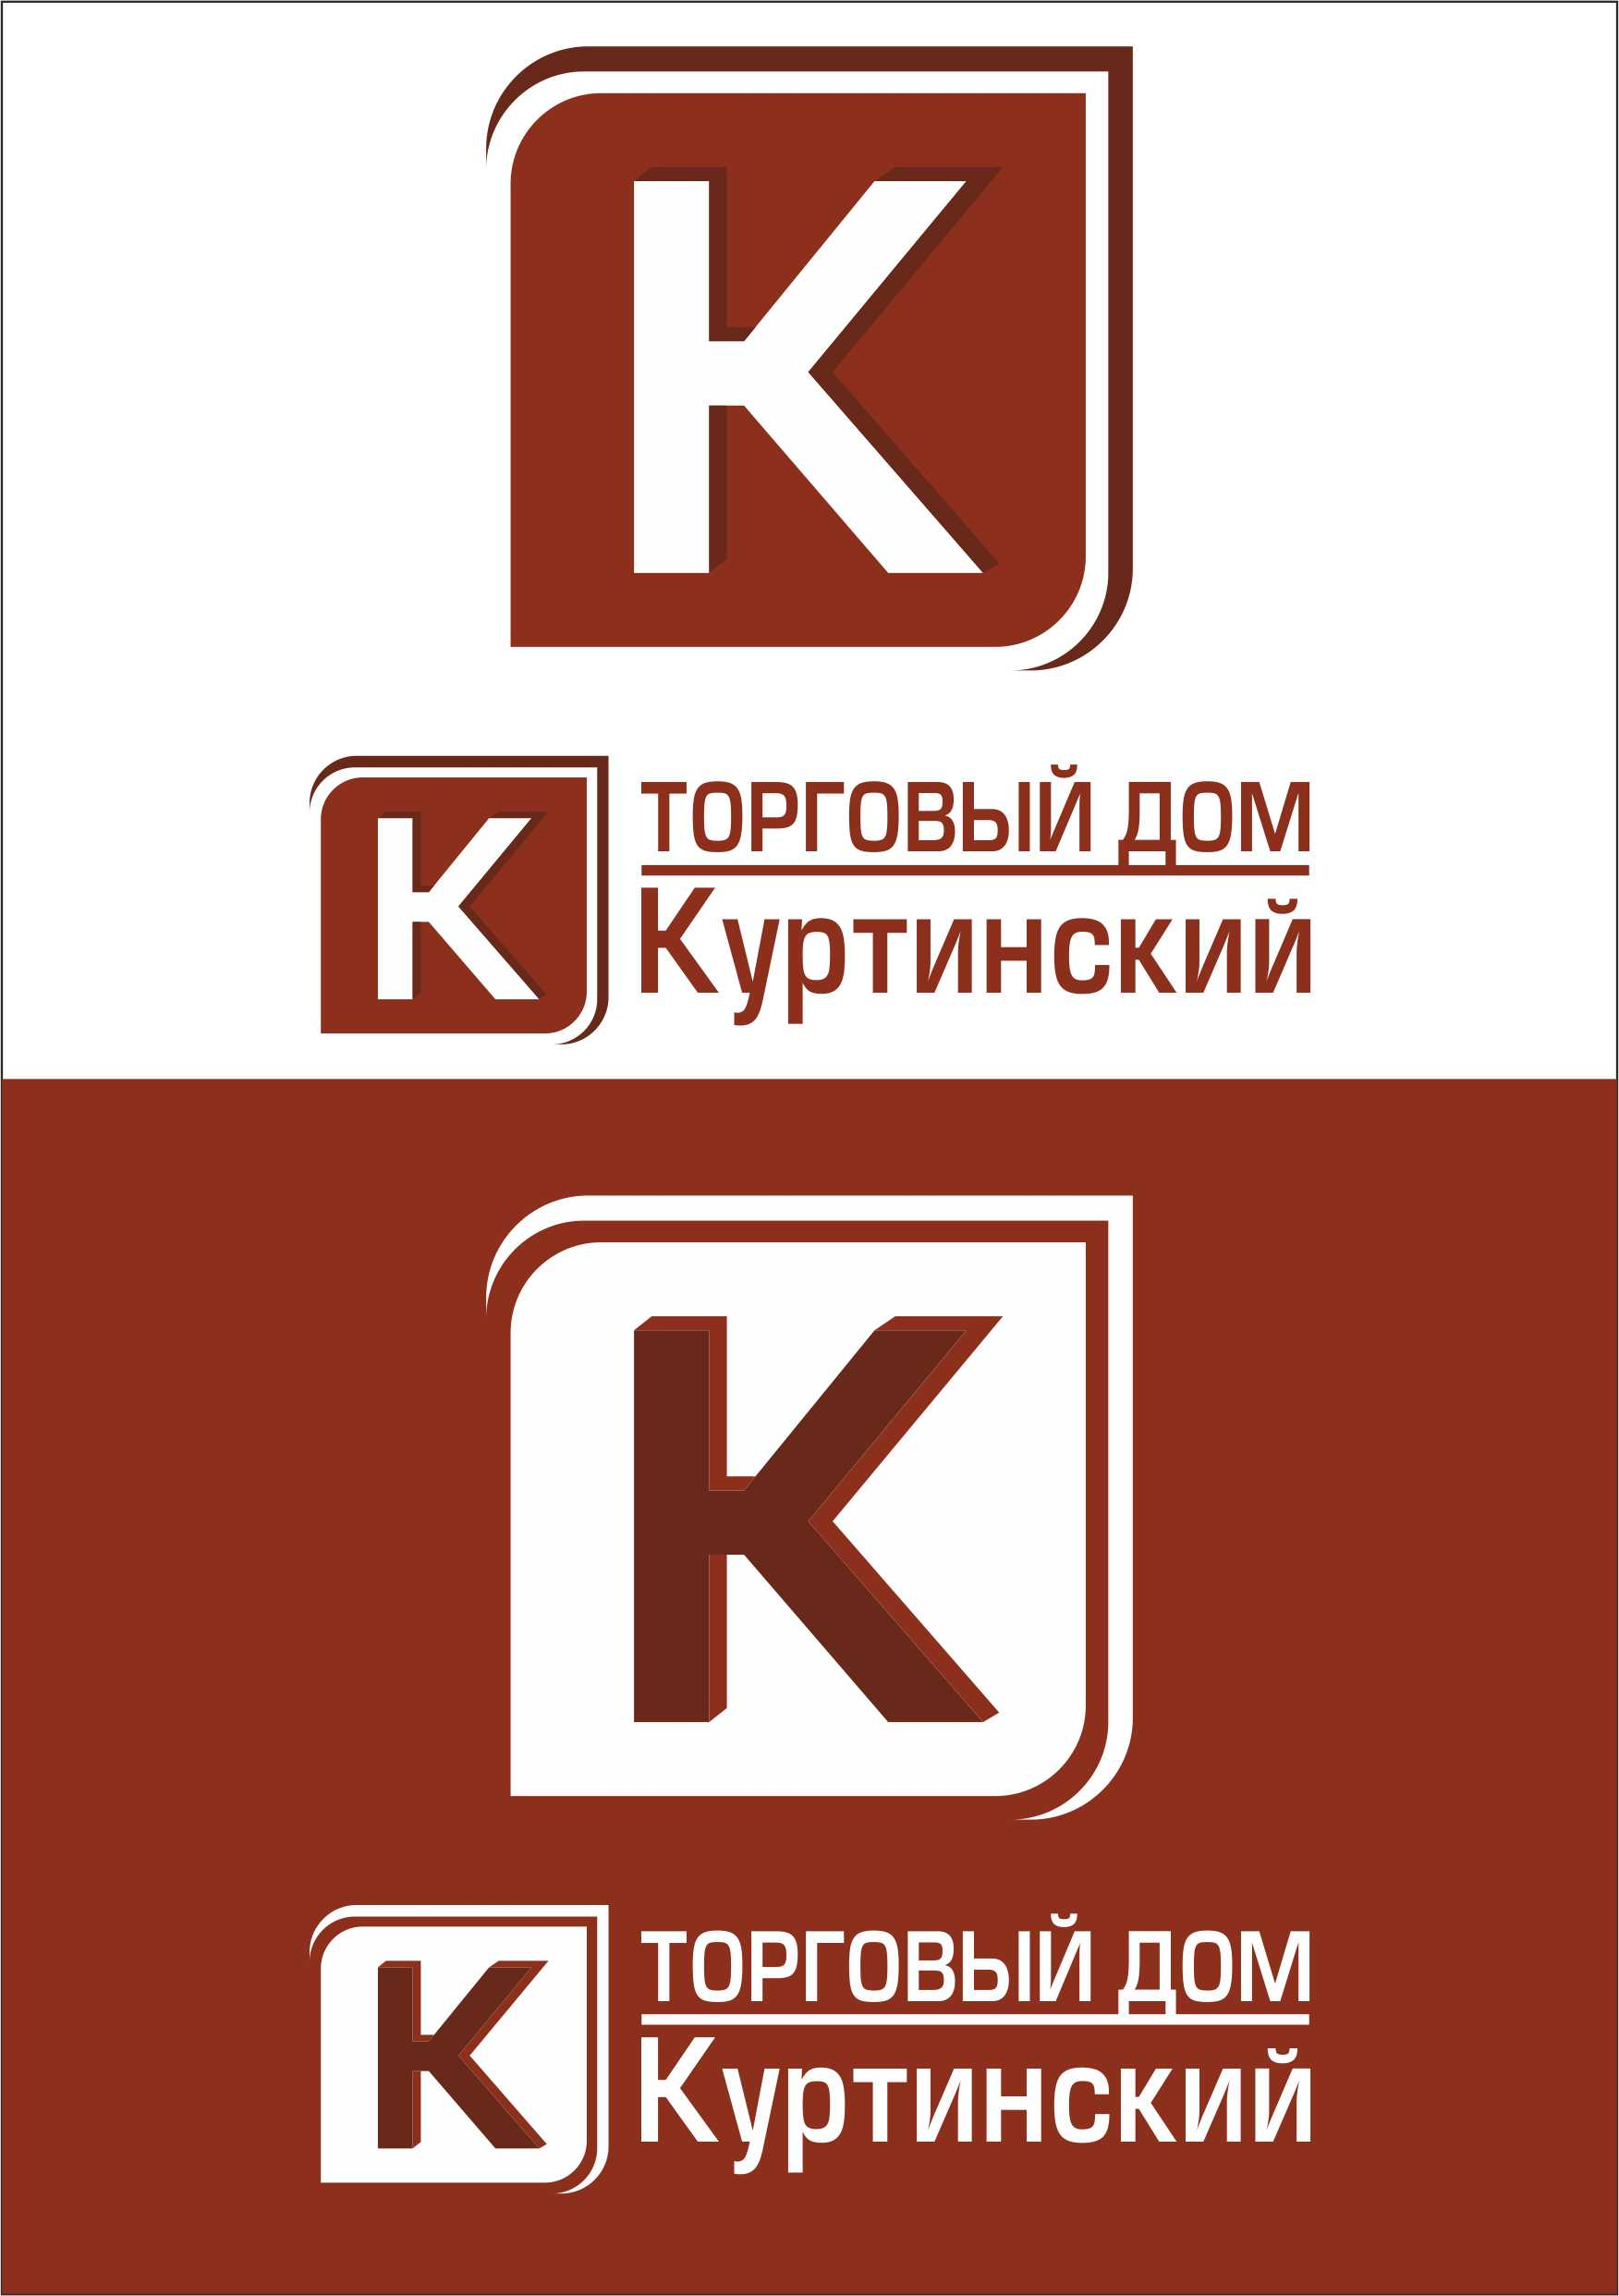 Логотип для камнедобывающей компании фото f_9655b98d83dad491.jpg